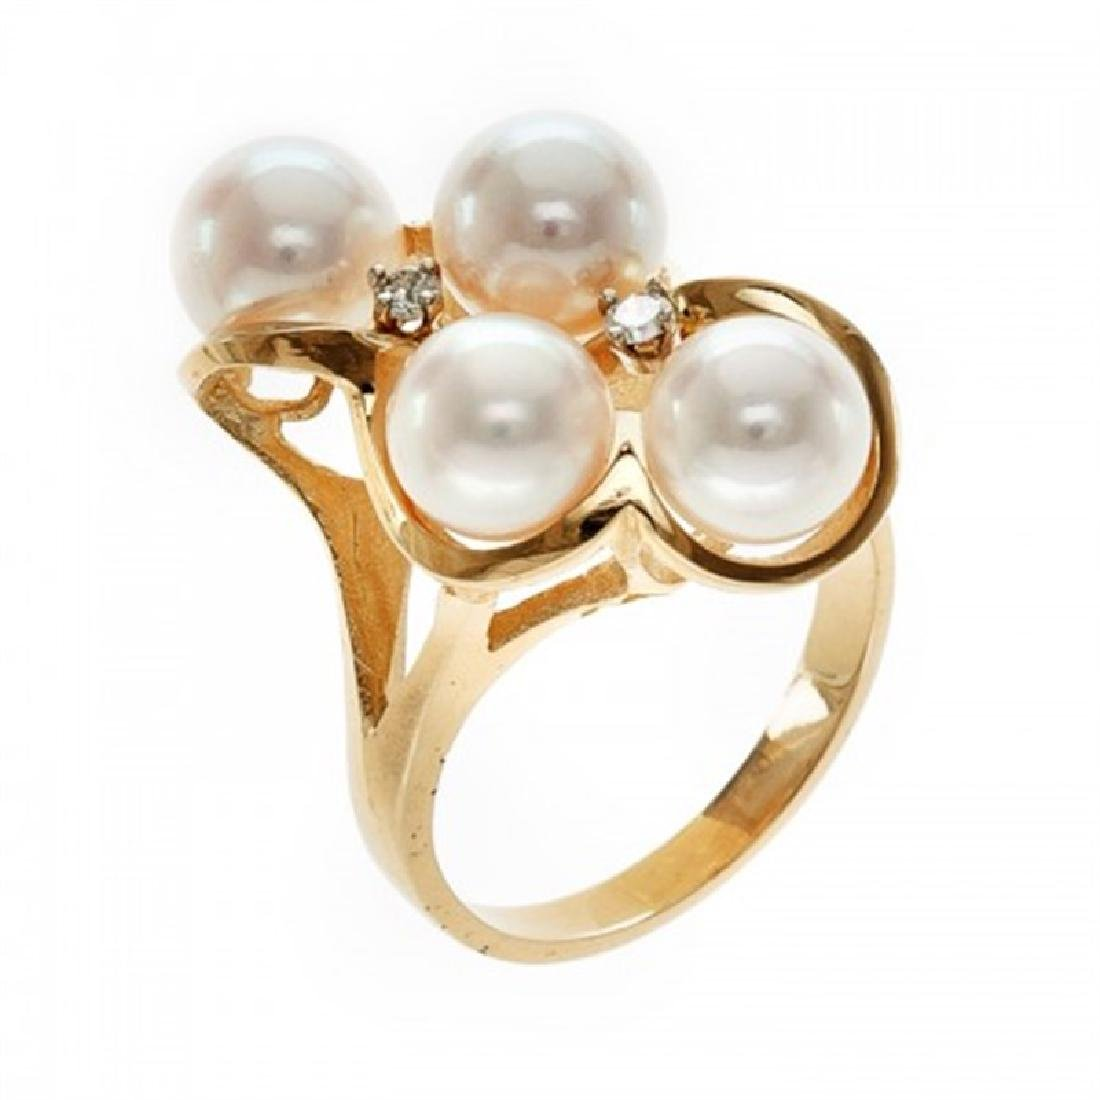 7.0-7.5mm Japanese Akoya Pearl Ring with Diamonds